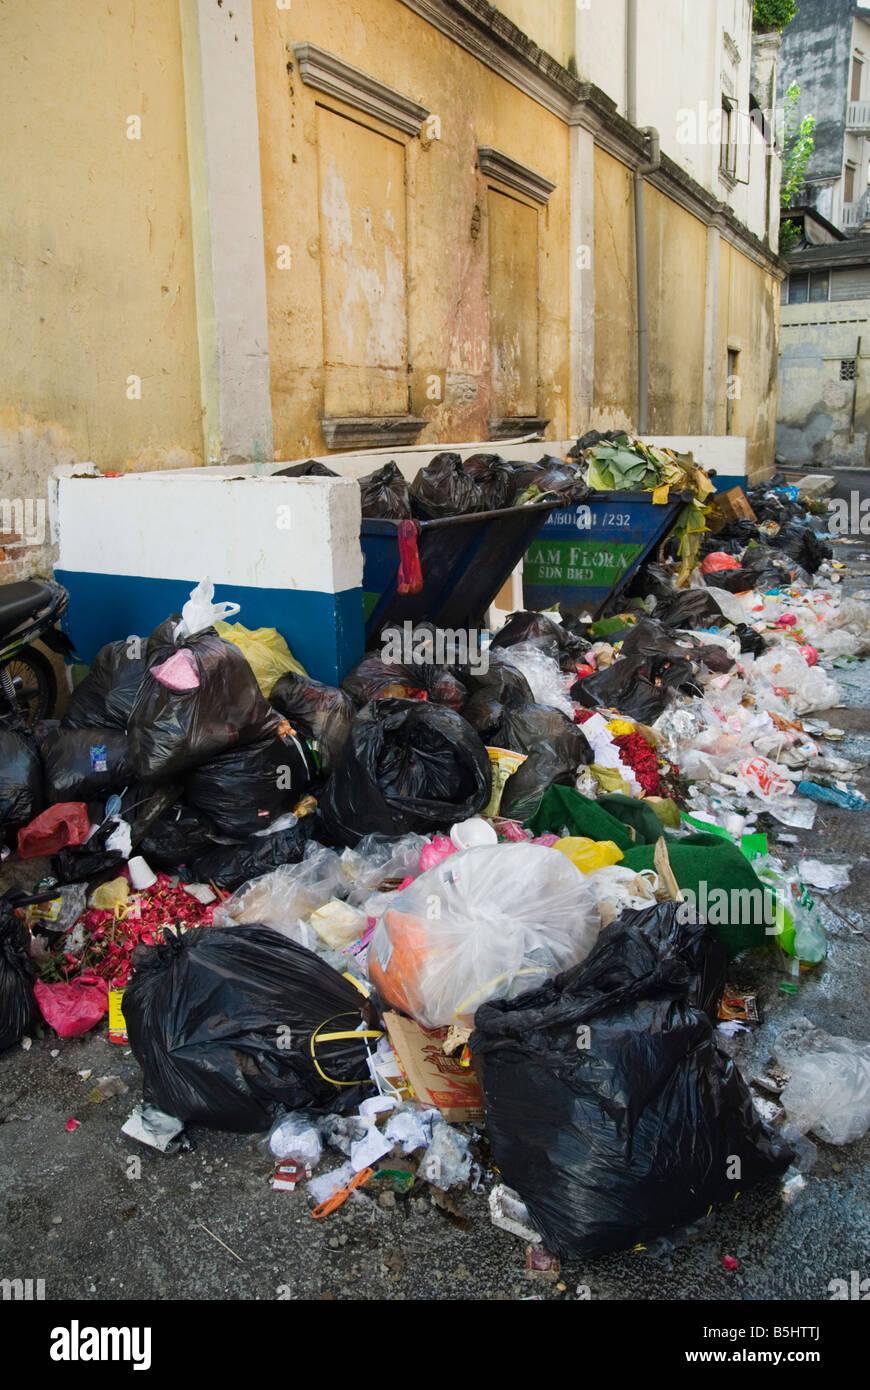 Overflowing rubbish bins - Stock Image